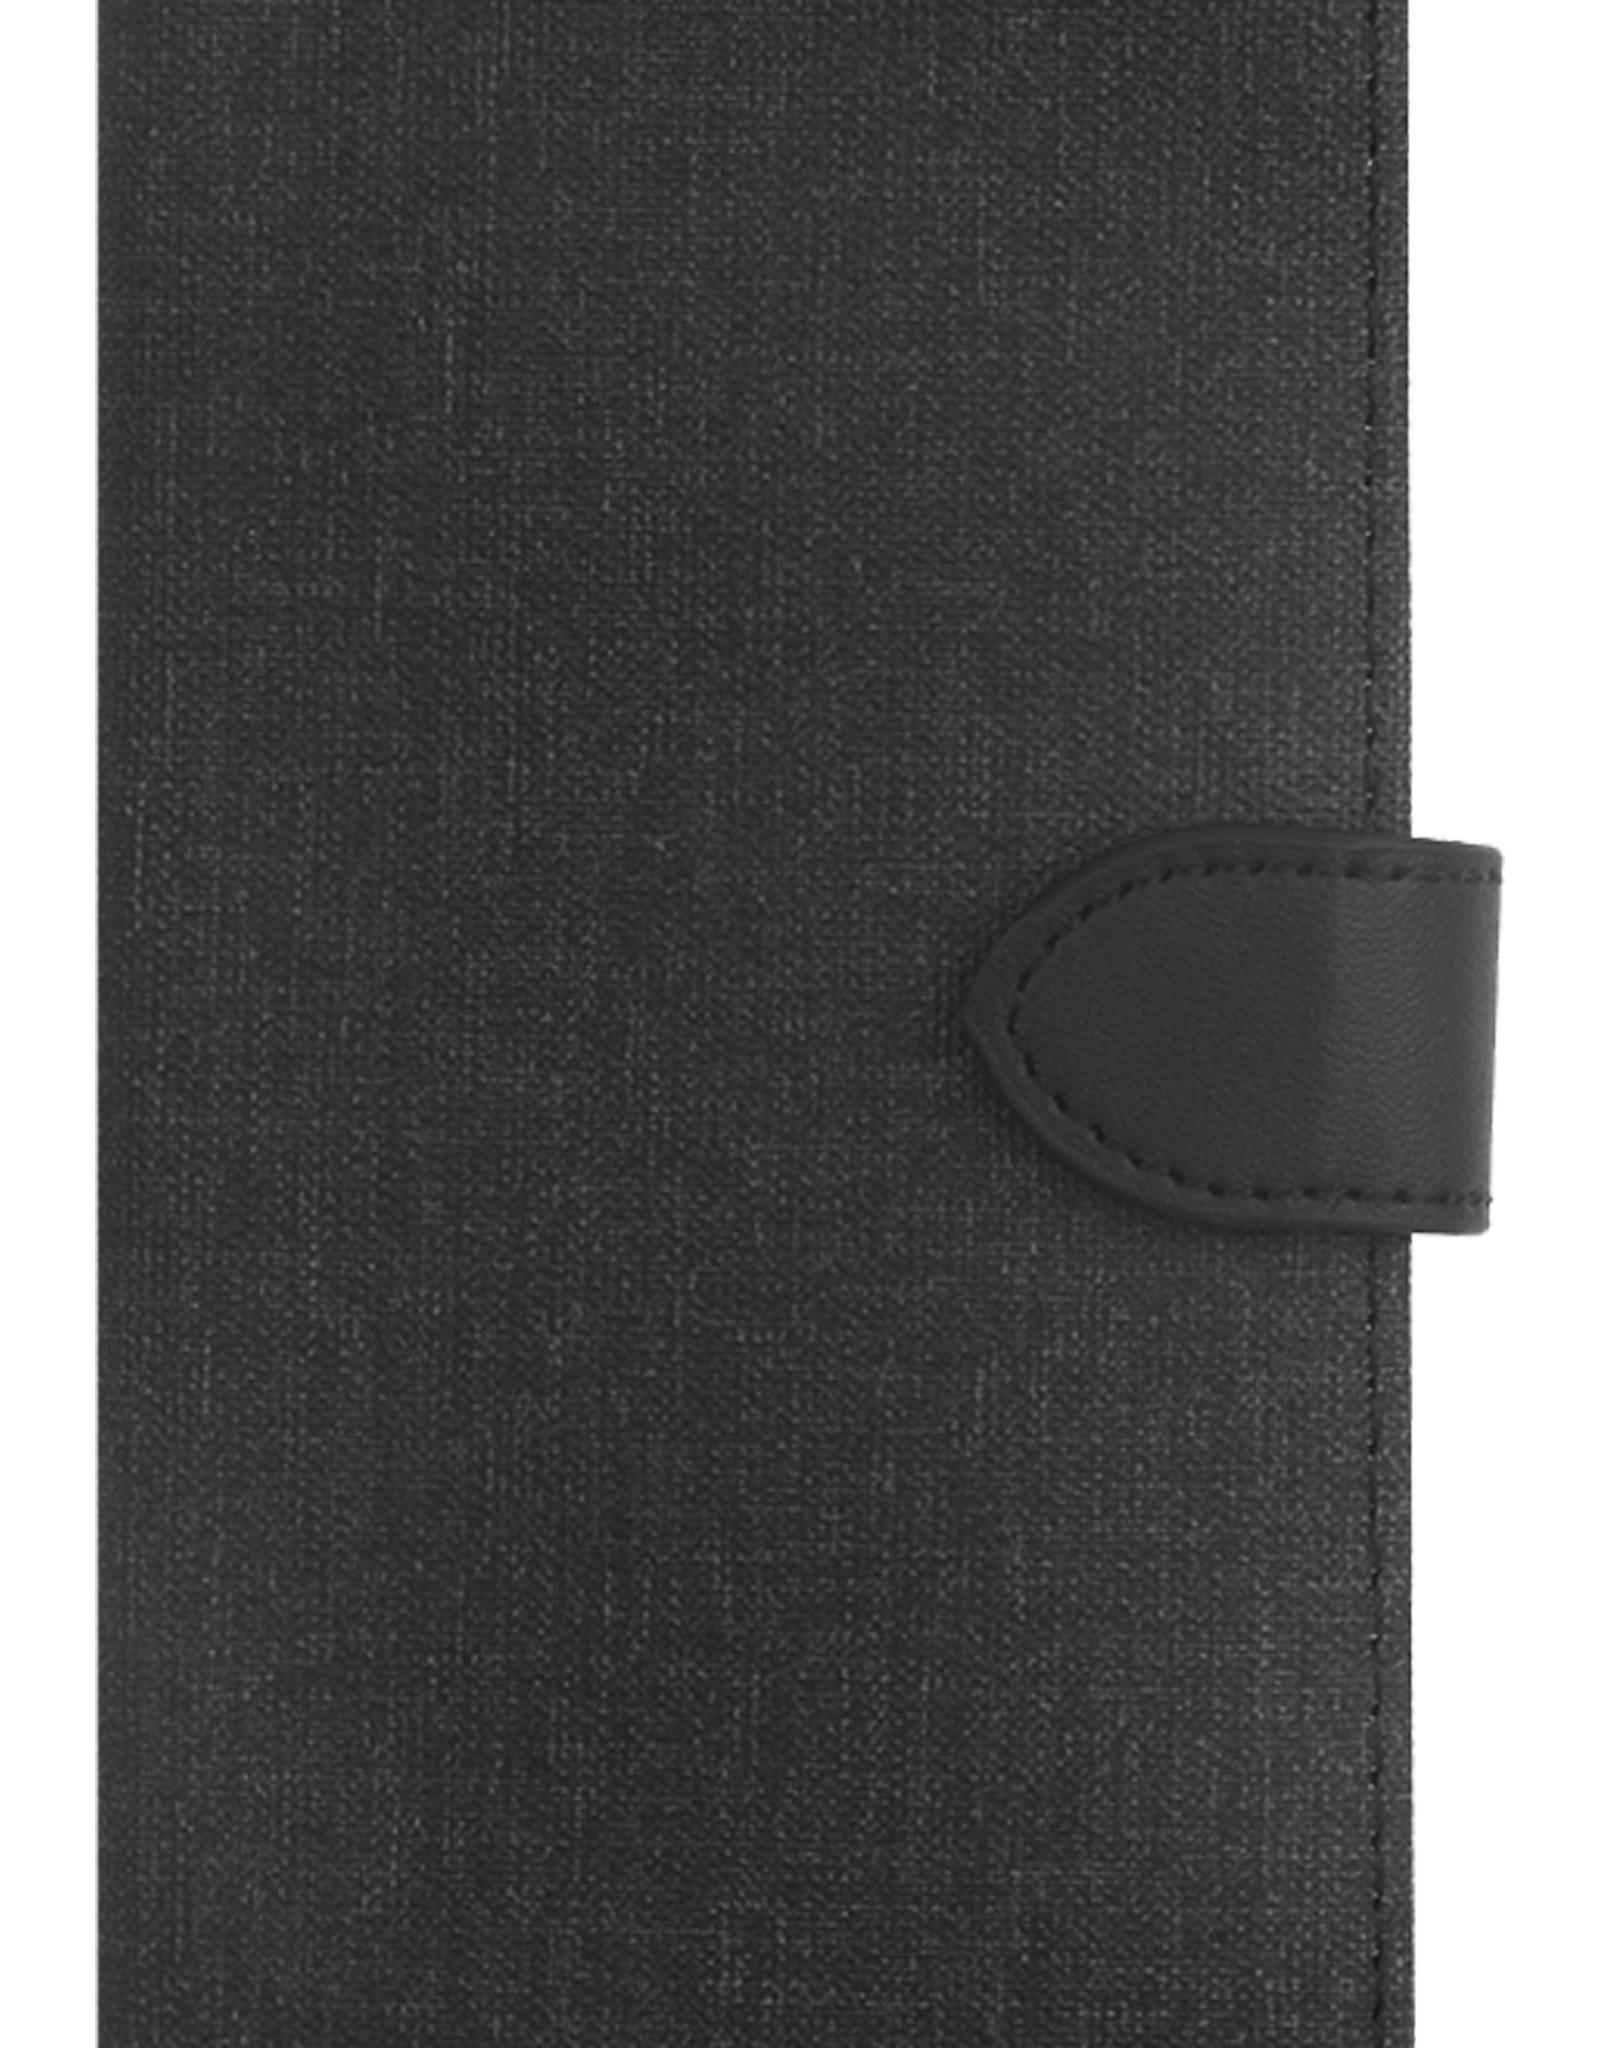 Blu Element Blu Element - 2 in 1 Folio Case Black/Black for LG G8 ThinQ 120-16667